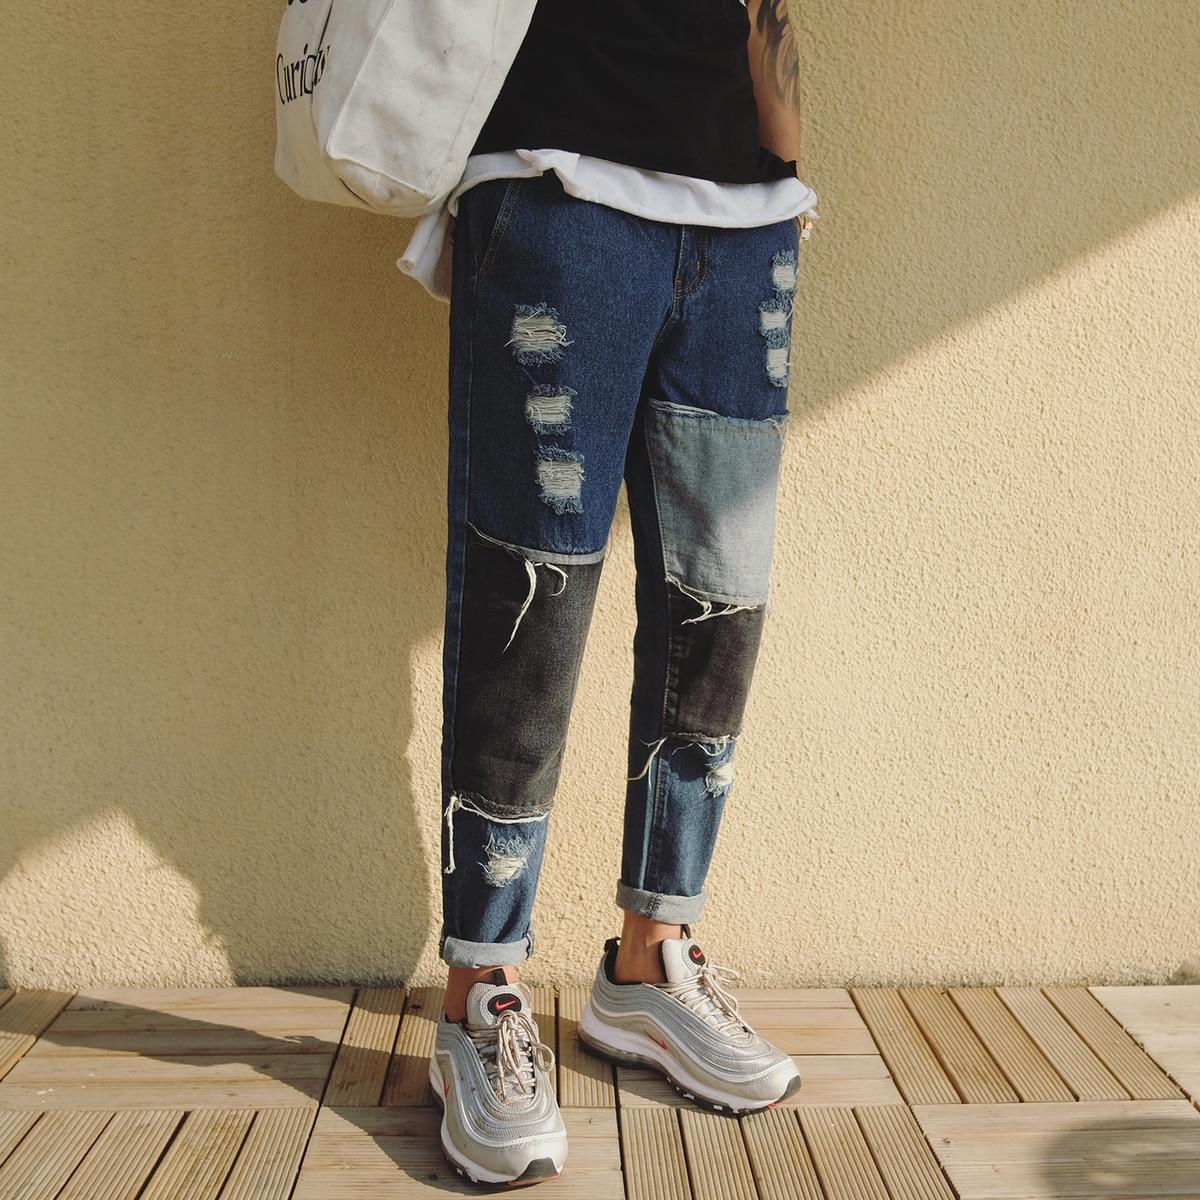 2018 Spring Newest Mens Fashion Korean Style Holes Patch Classic Stretch Slim Fit Denim Pants Blue Jeans Trousers Size 28-34